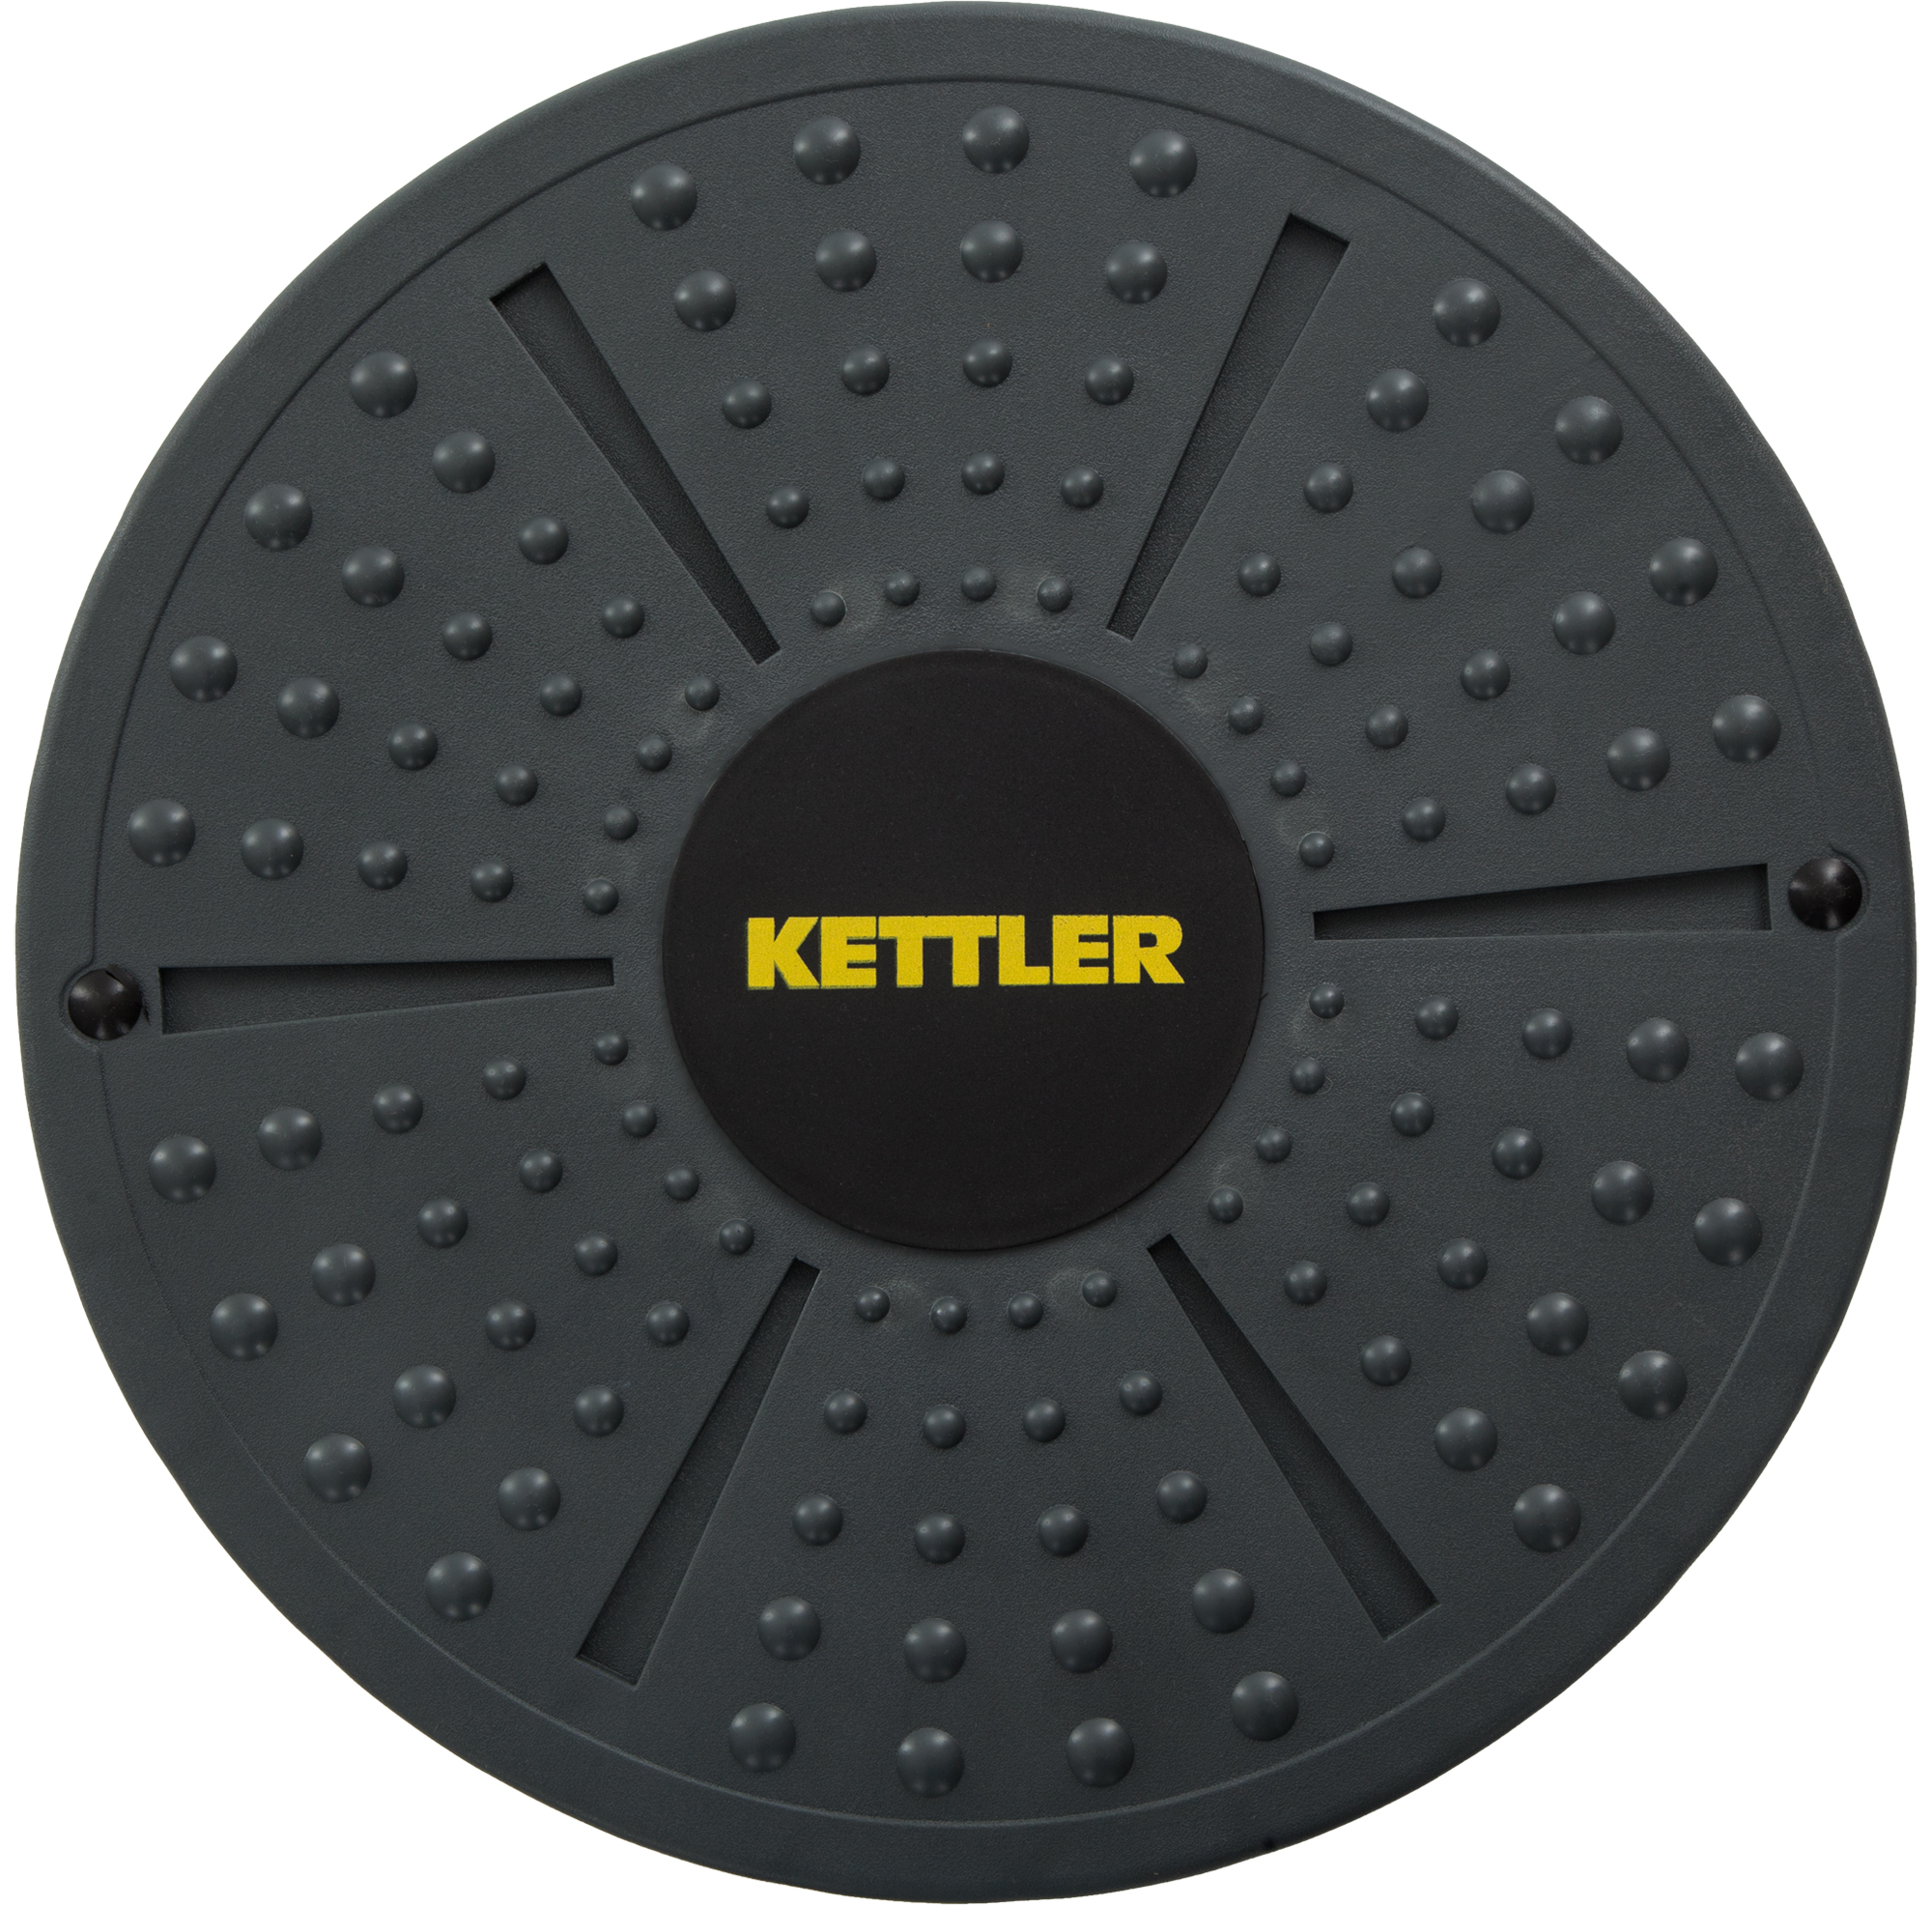 Kettler Балансировочная платформа 7373-300